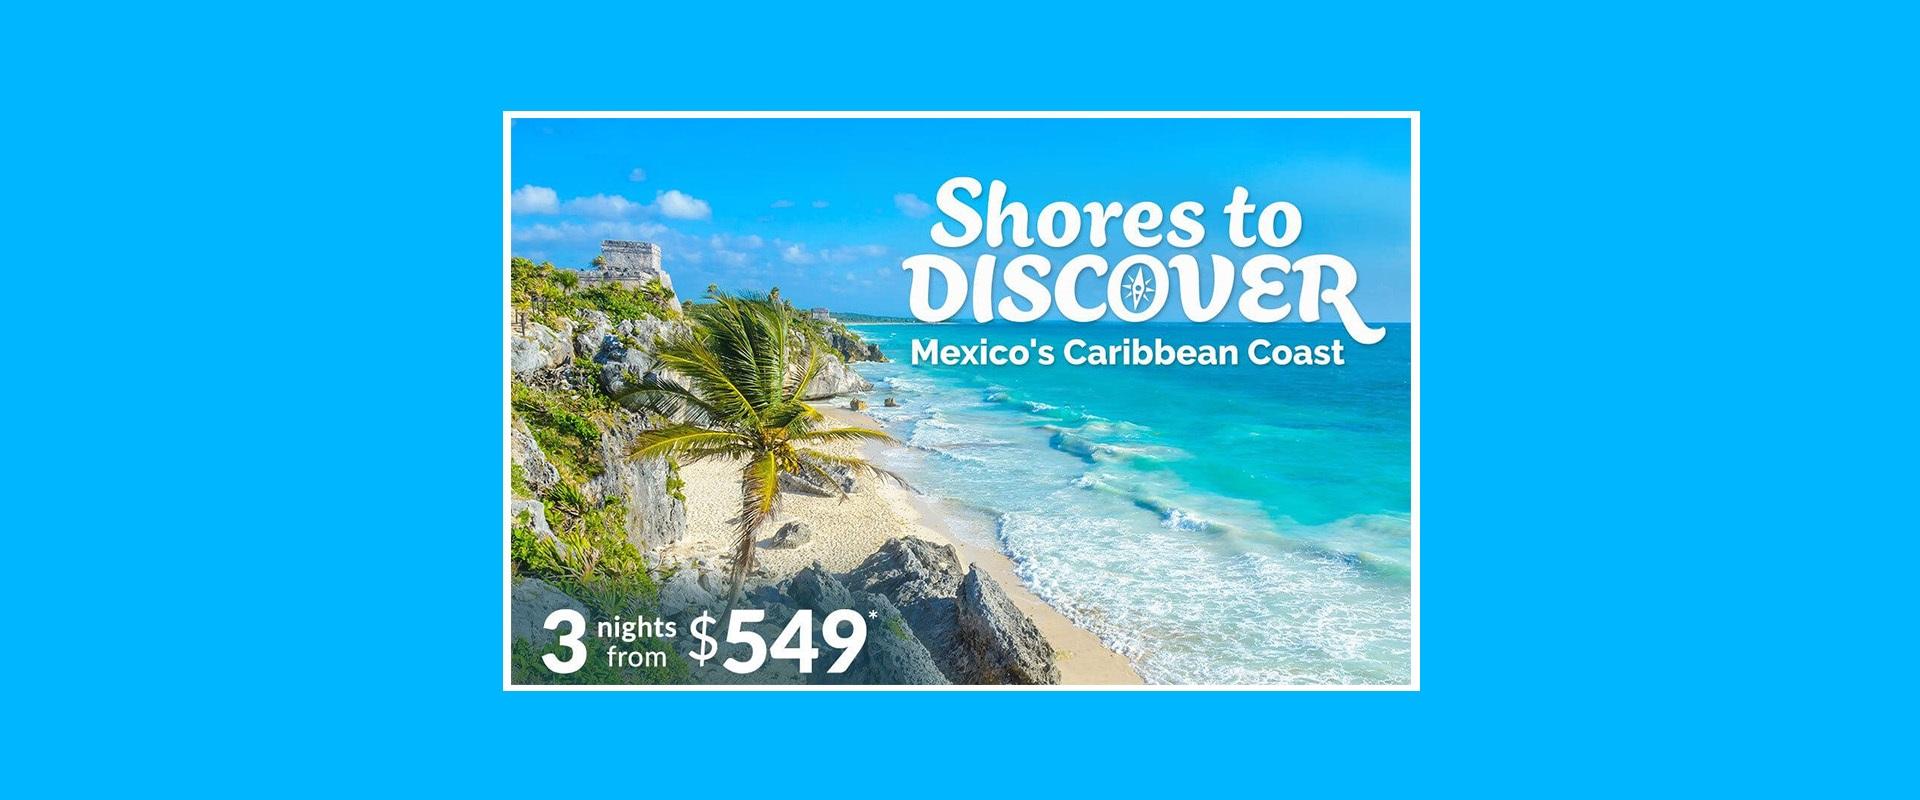 Mexico-Caribbean-Coast-Special-Banner